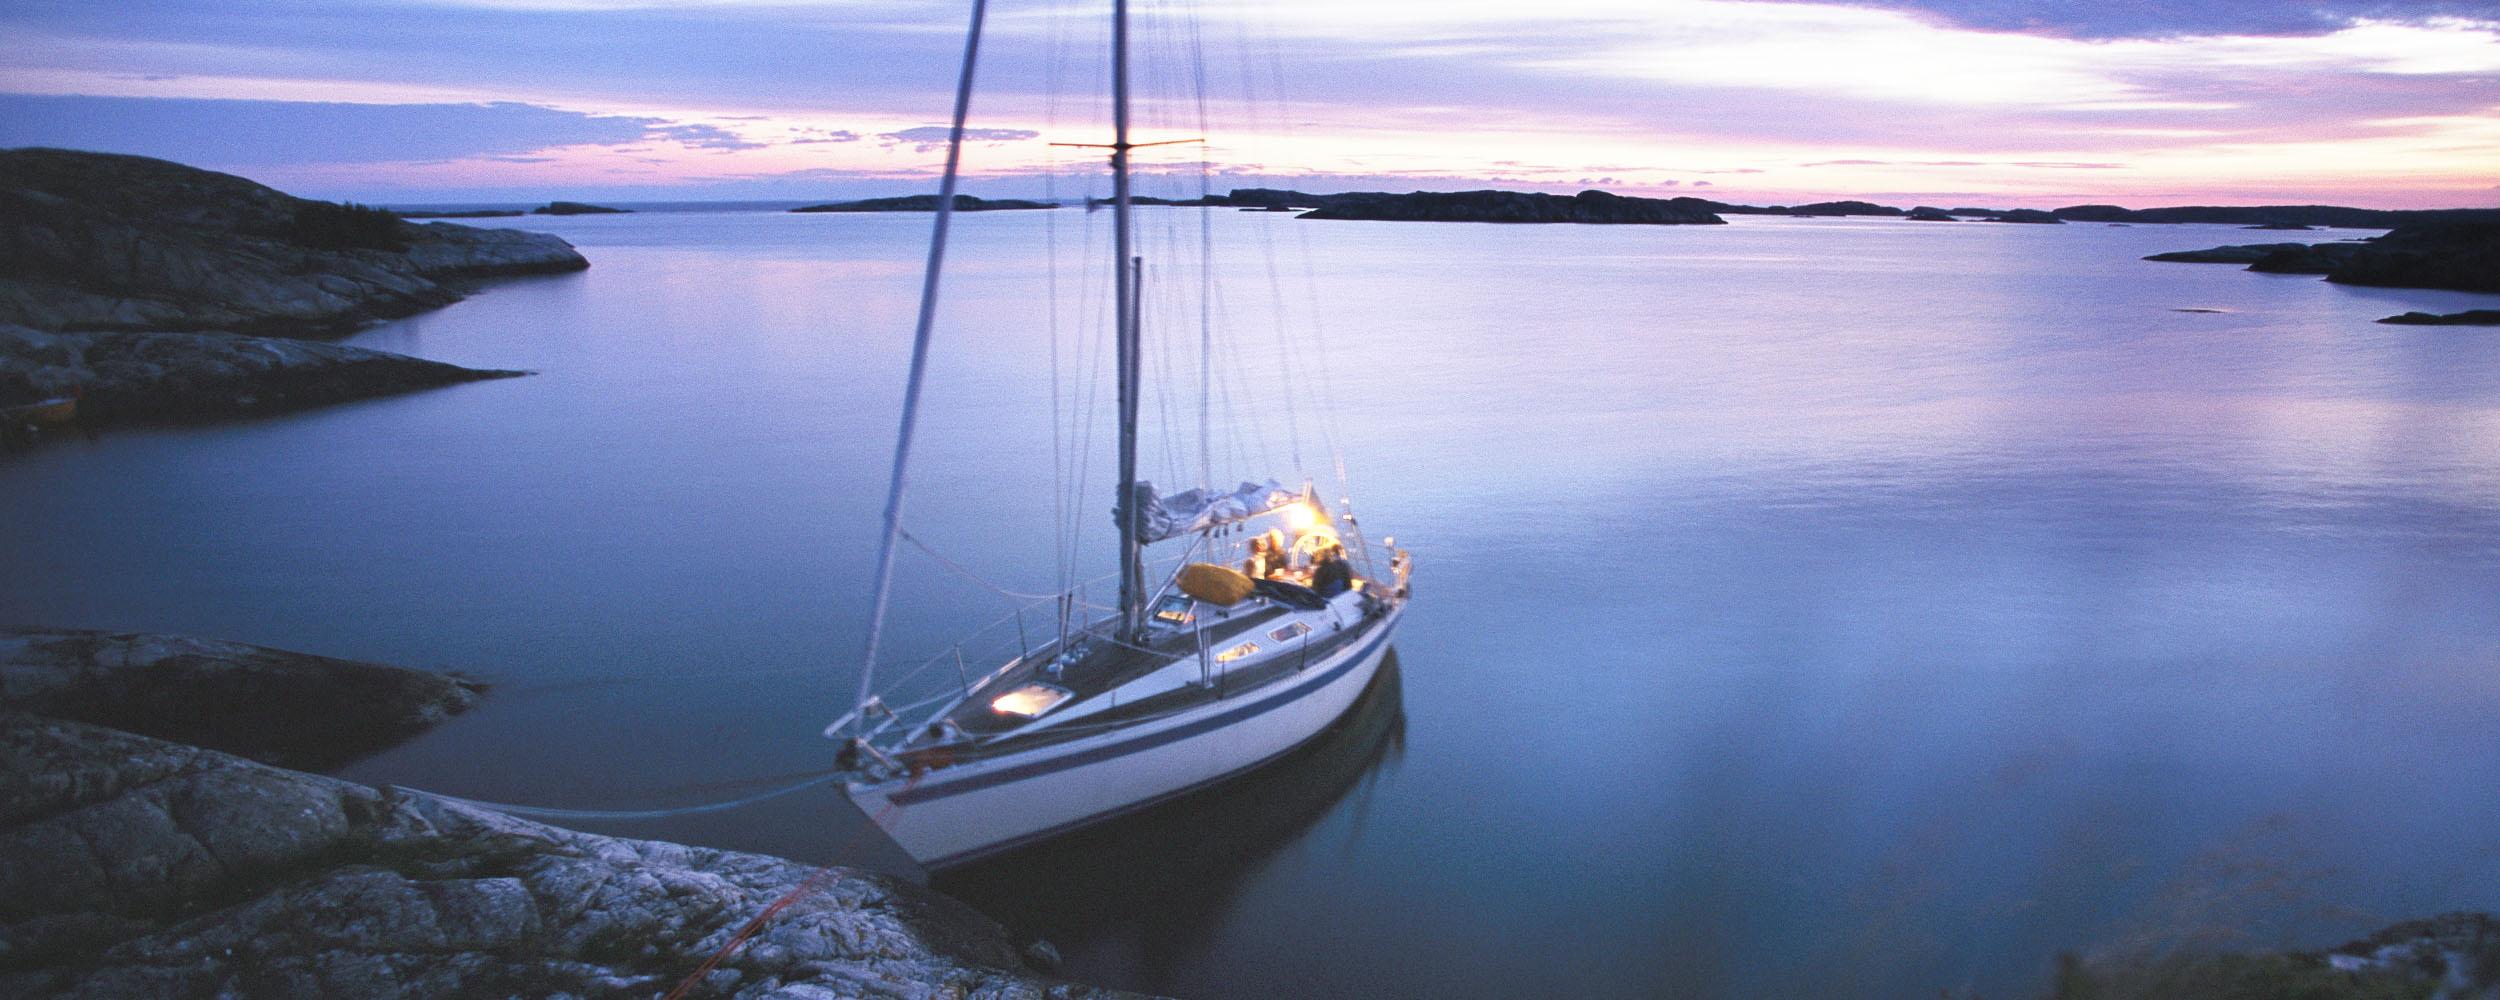 imagebild_boat